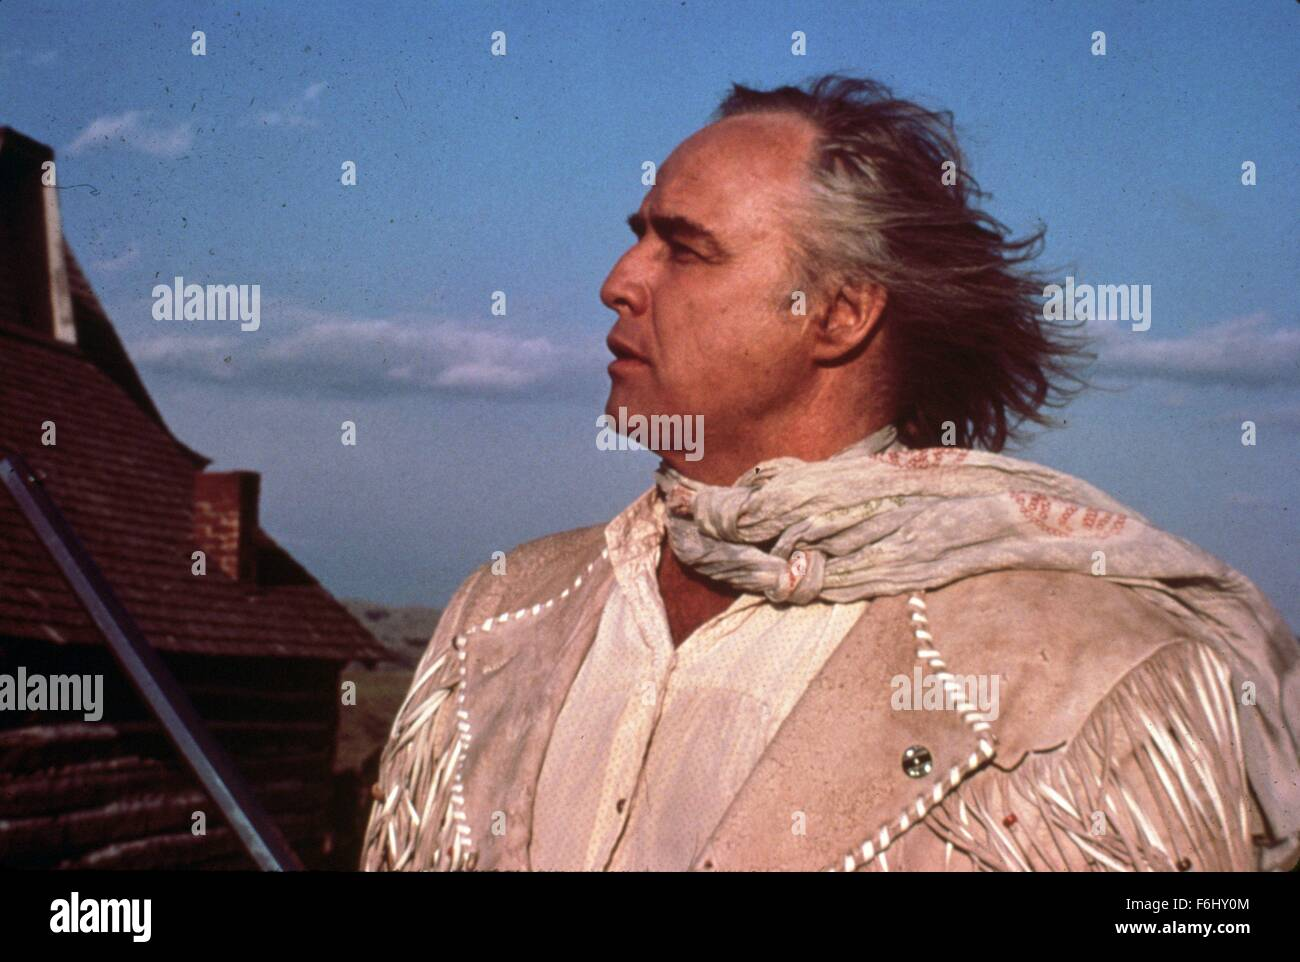 1976, Film Title: MISSOURI BREAKS, Director: ARTHUR PENN,  Pictured: MARLON BRANDO. - Stock Image